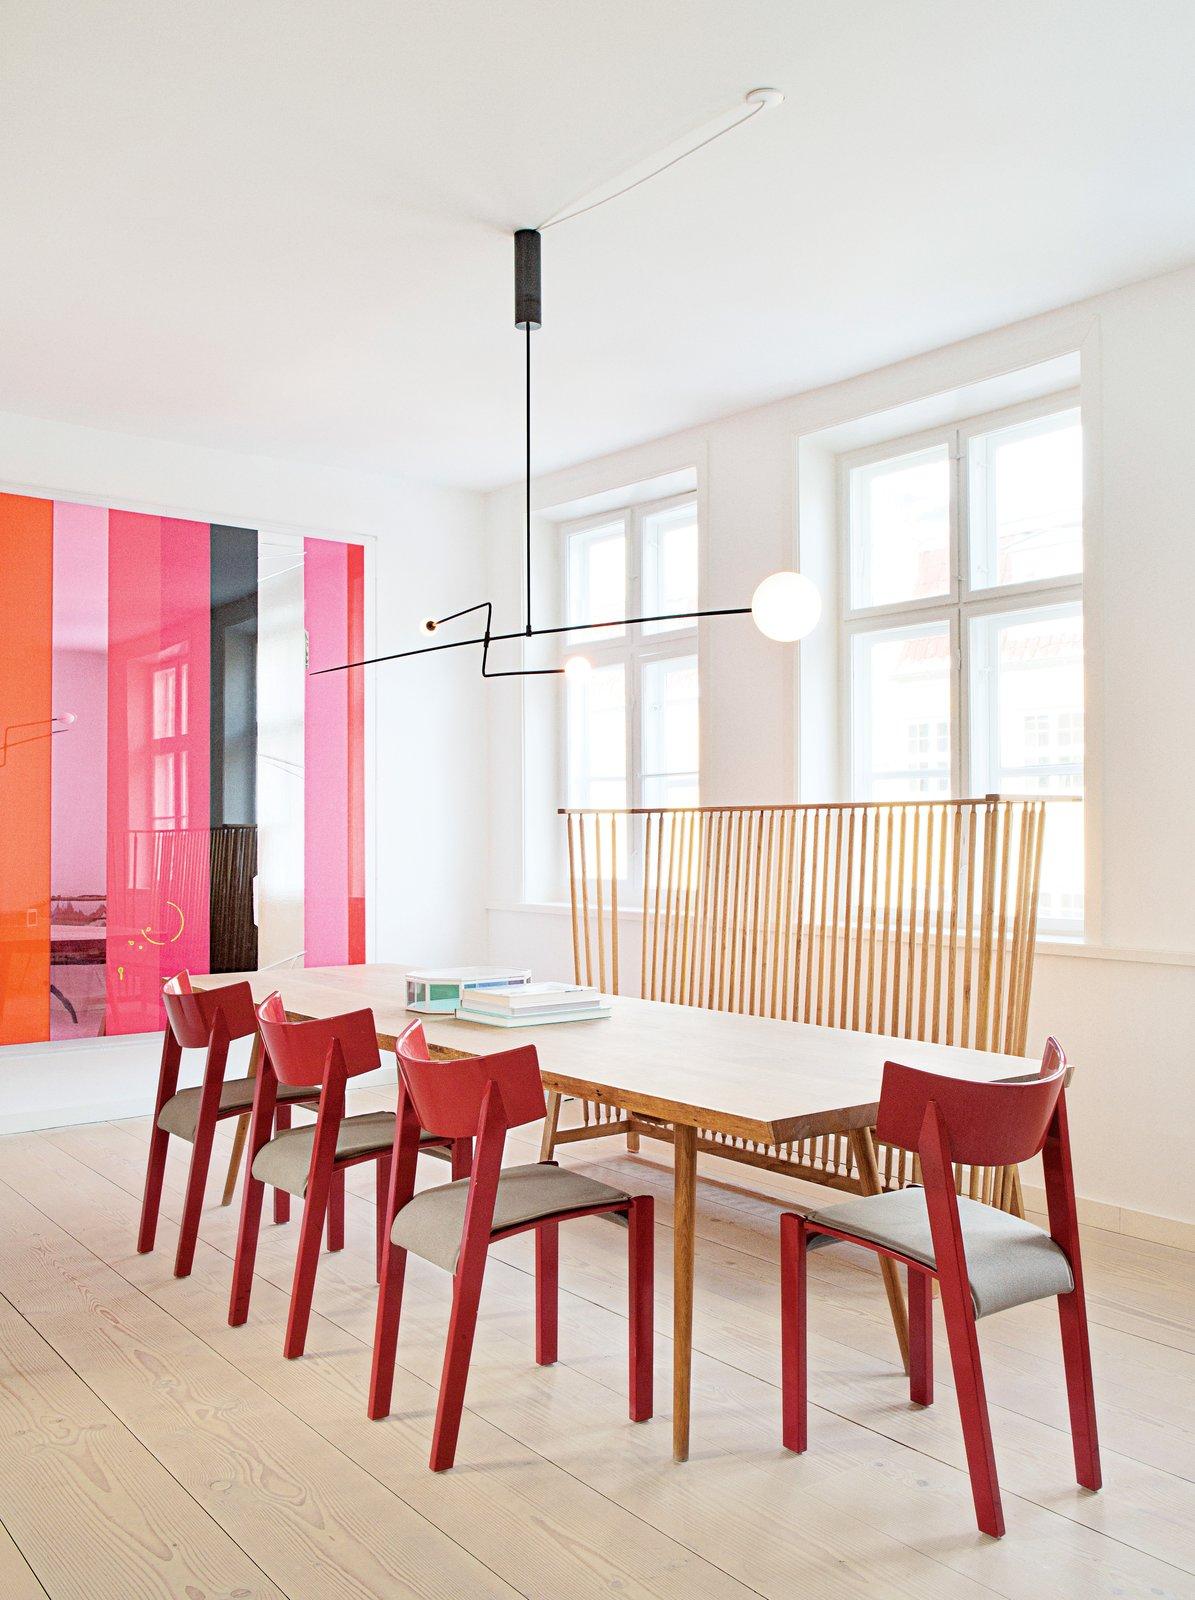 #seatingdesign #seating #diningroom #diningtable #table #chairs #color #modern #contemporary #minimalist #apartment #showroom #MobileChandelier3 #MichaelAnastassiades #KøbenhavnsMøbelsnedkeri #Vintage #red #color #RalfLindberg #IlseCrawford #DeLaEspada   Photo courtesy of the Apartment  100+ Best Modern Seating Designs by Dwell